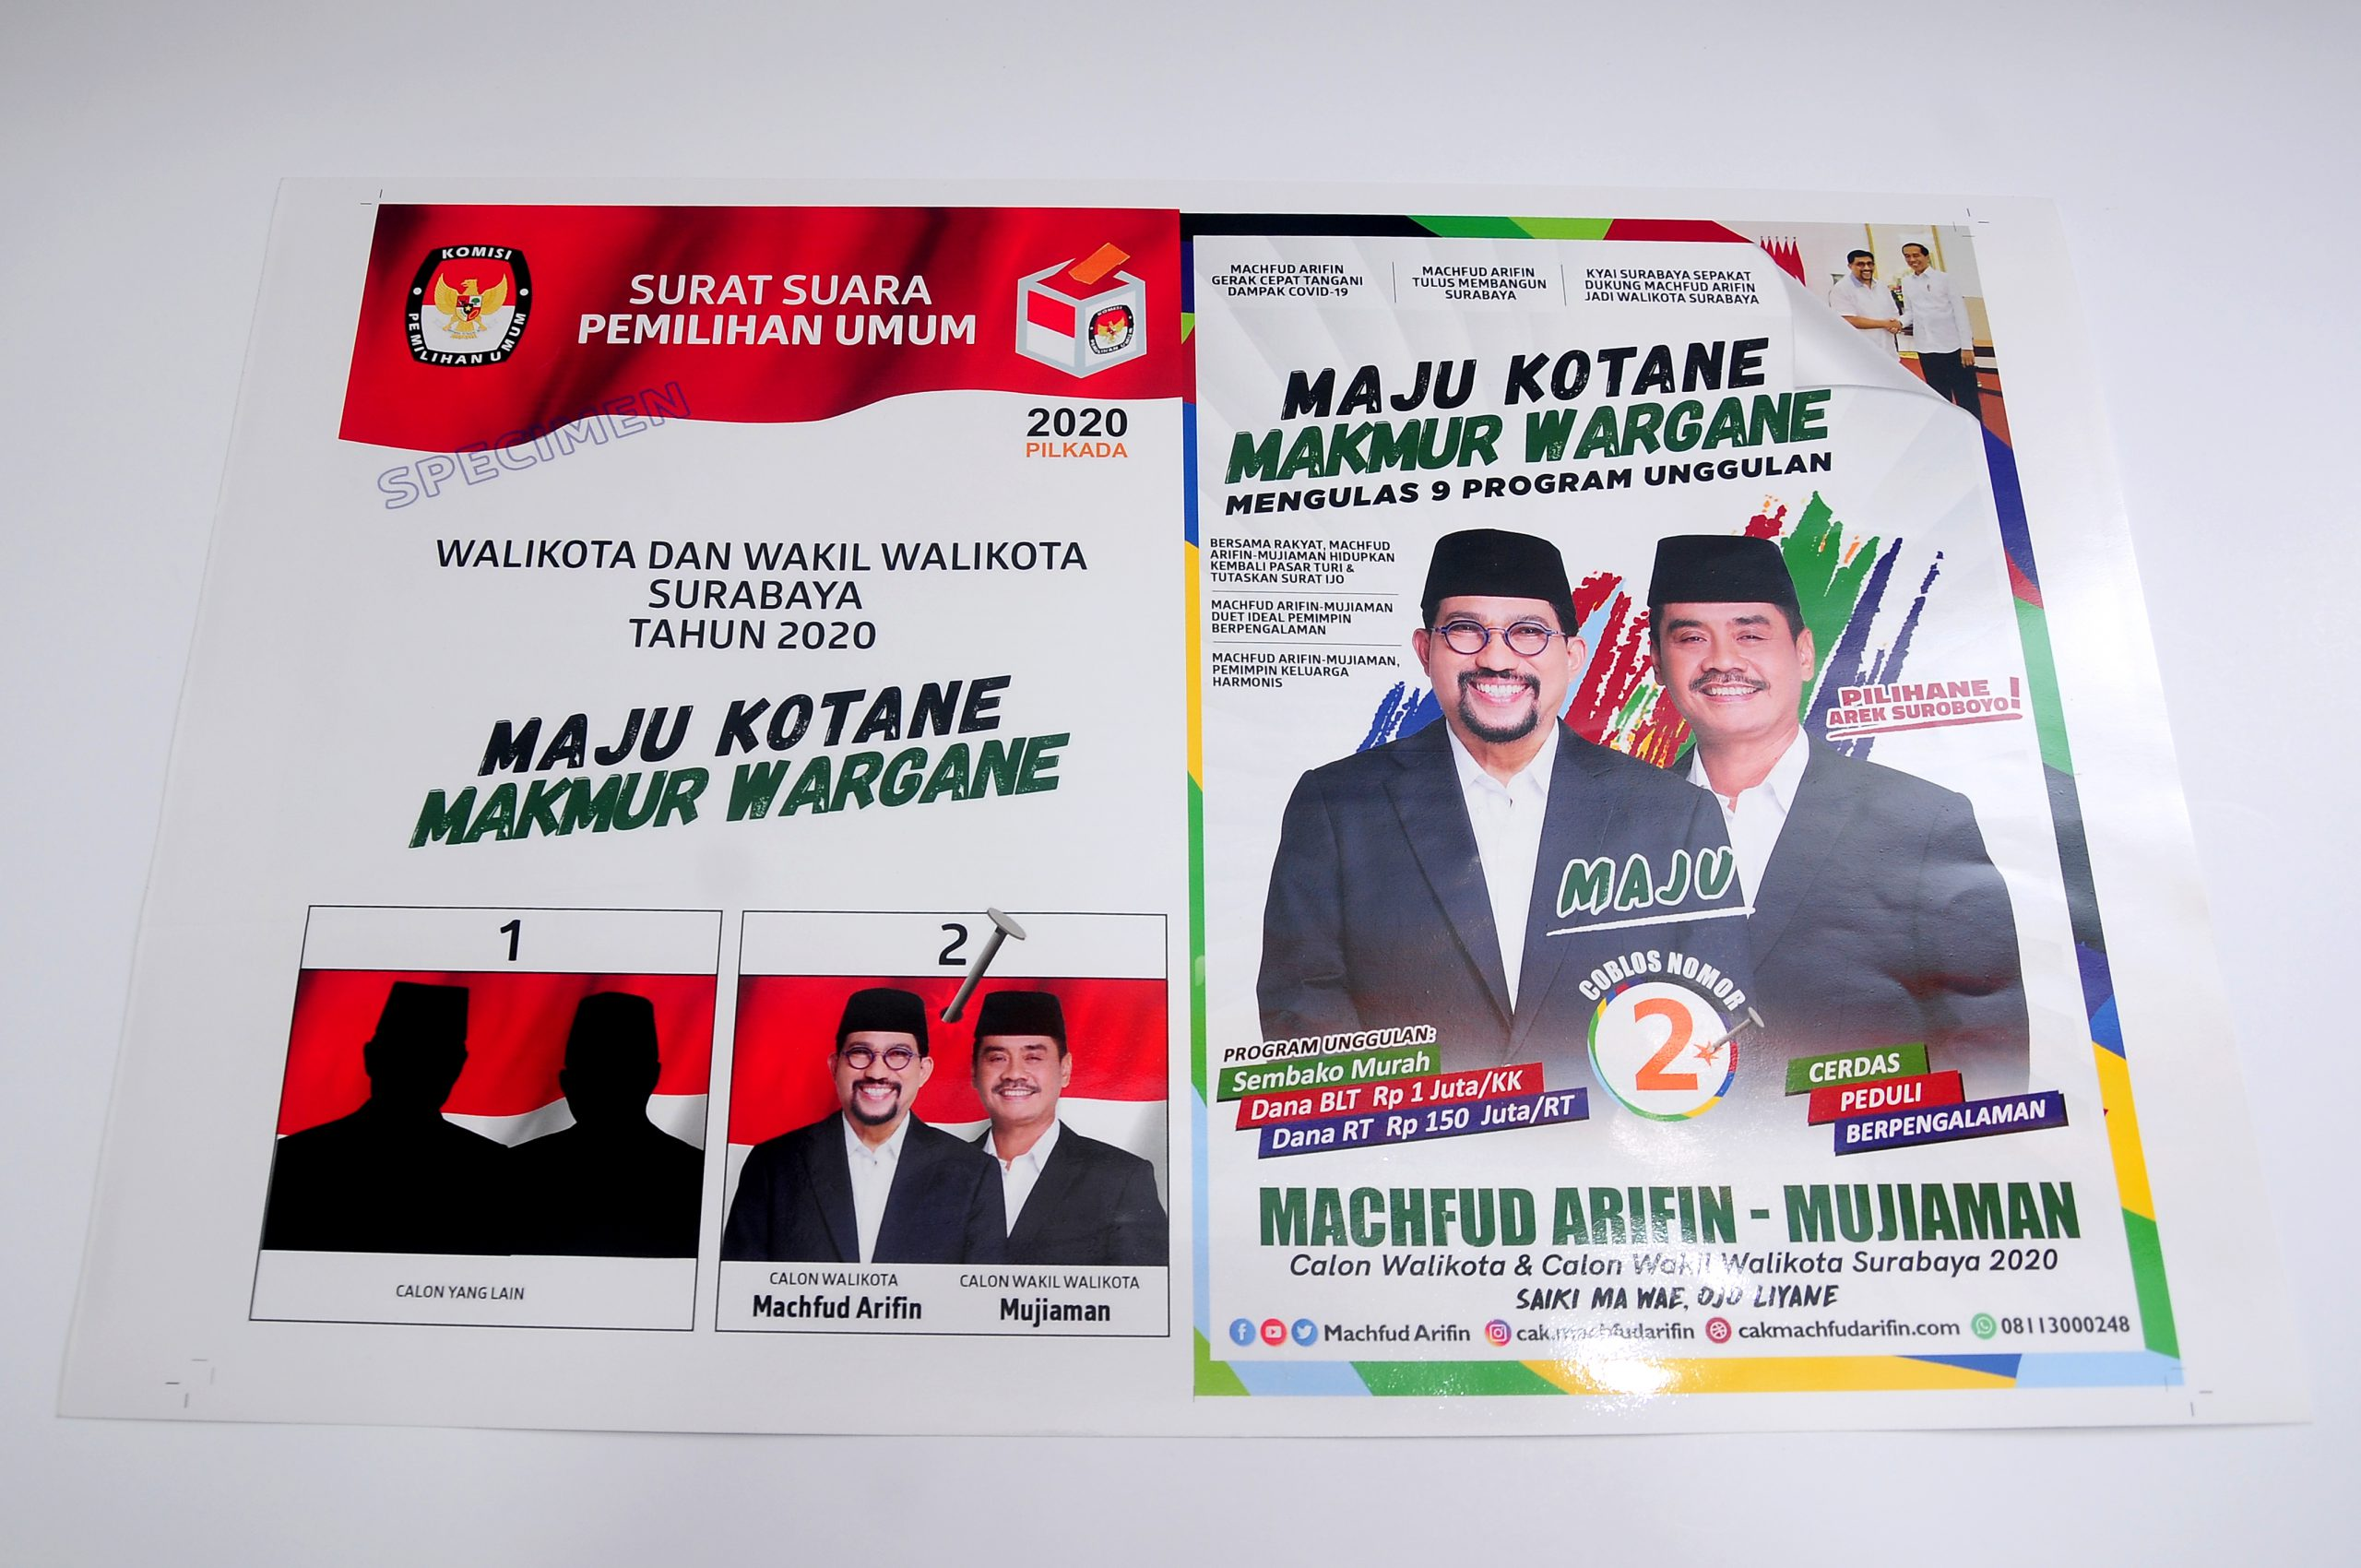 Alat Peraga kampanye (tabloid 1)